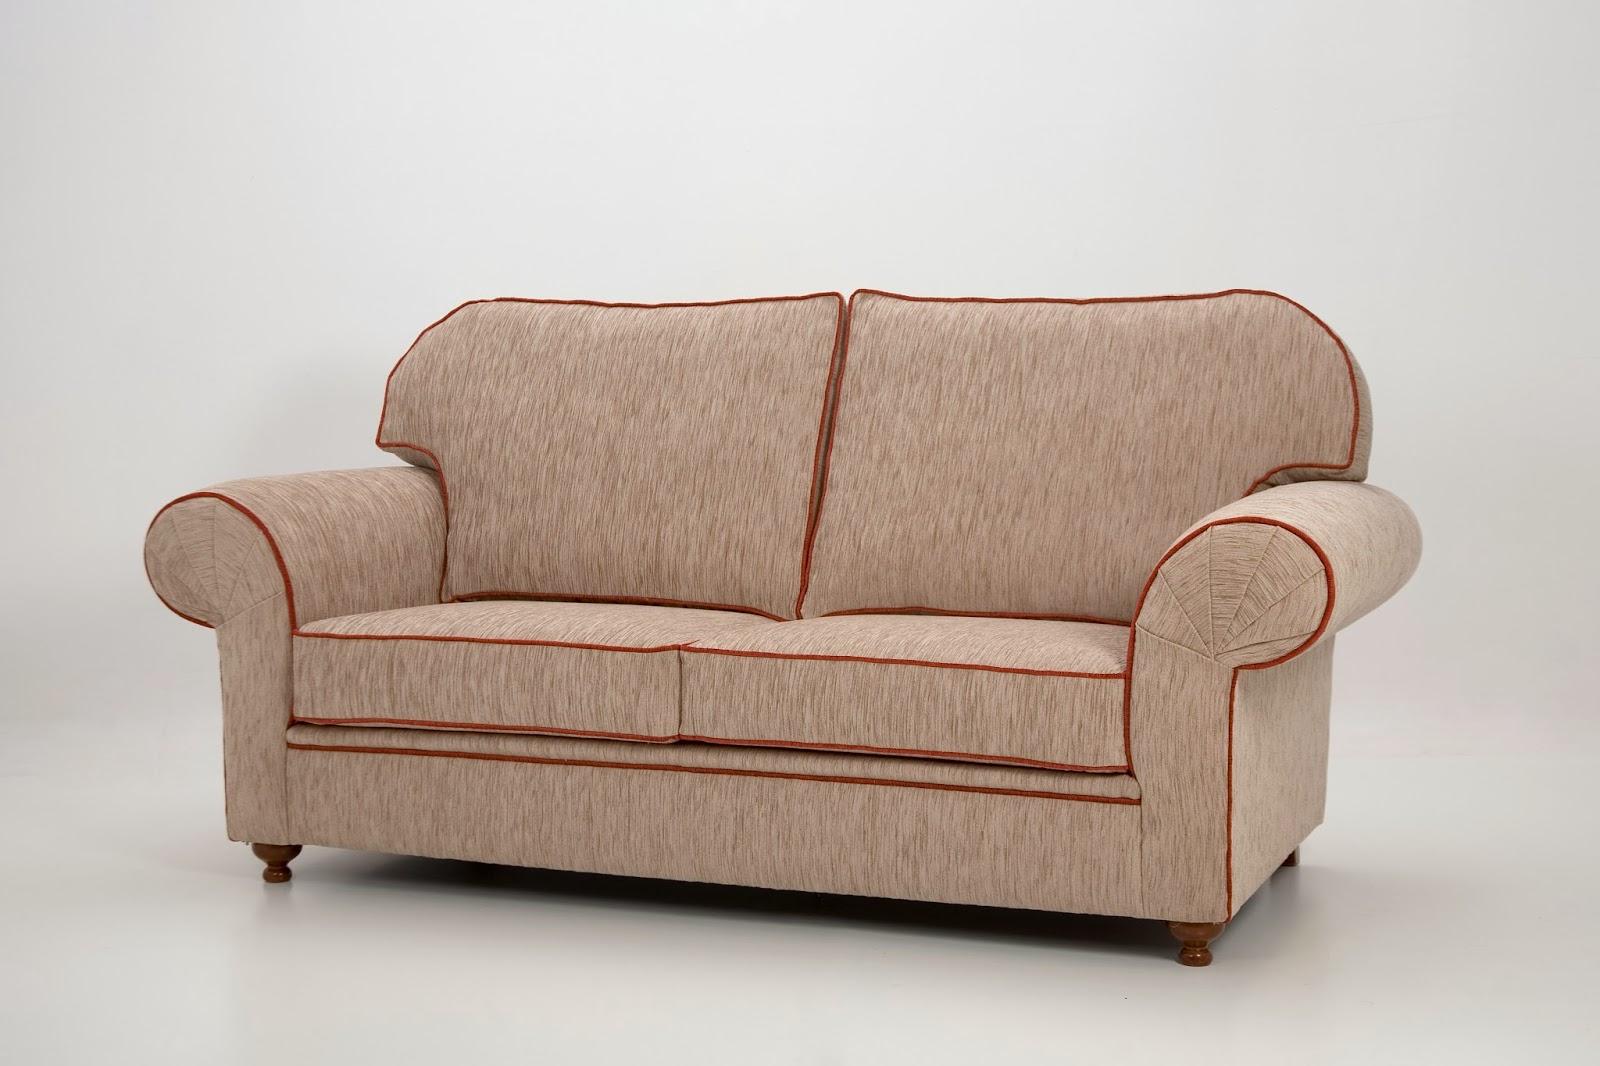 Tapizados sofas clasicos y de dise os fabrica en for Sofas tapizados clasicos